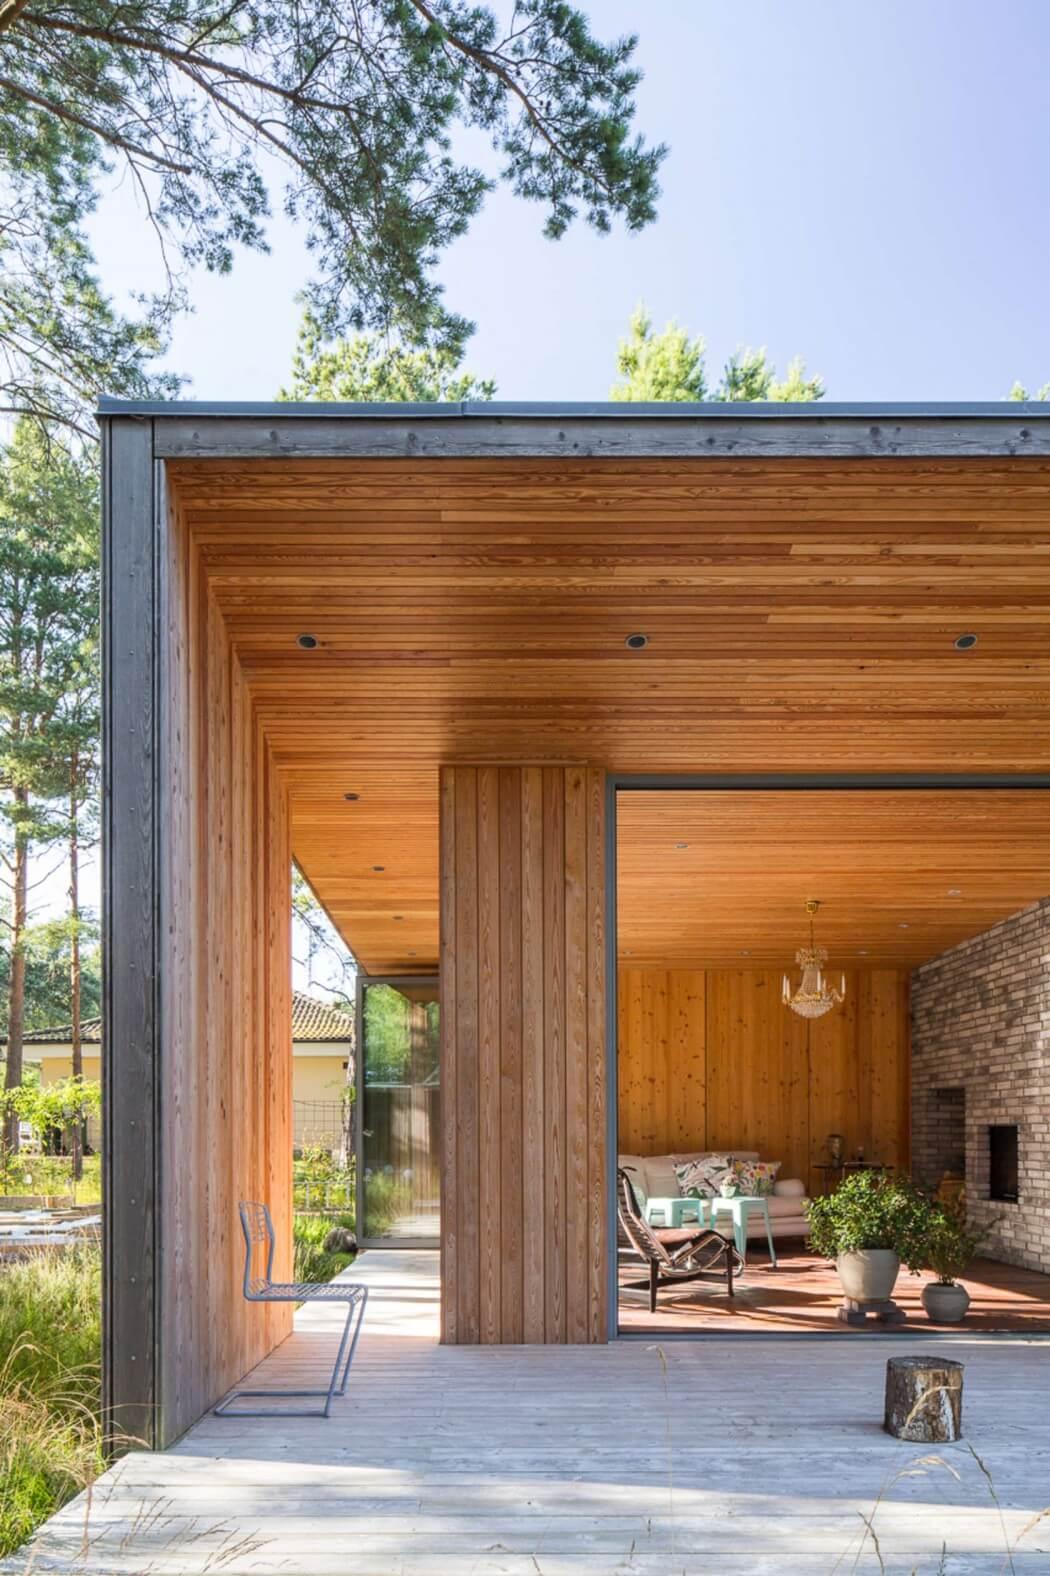 014-villa-ljung-johan-sundberg-arkitektur-1050x1576